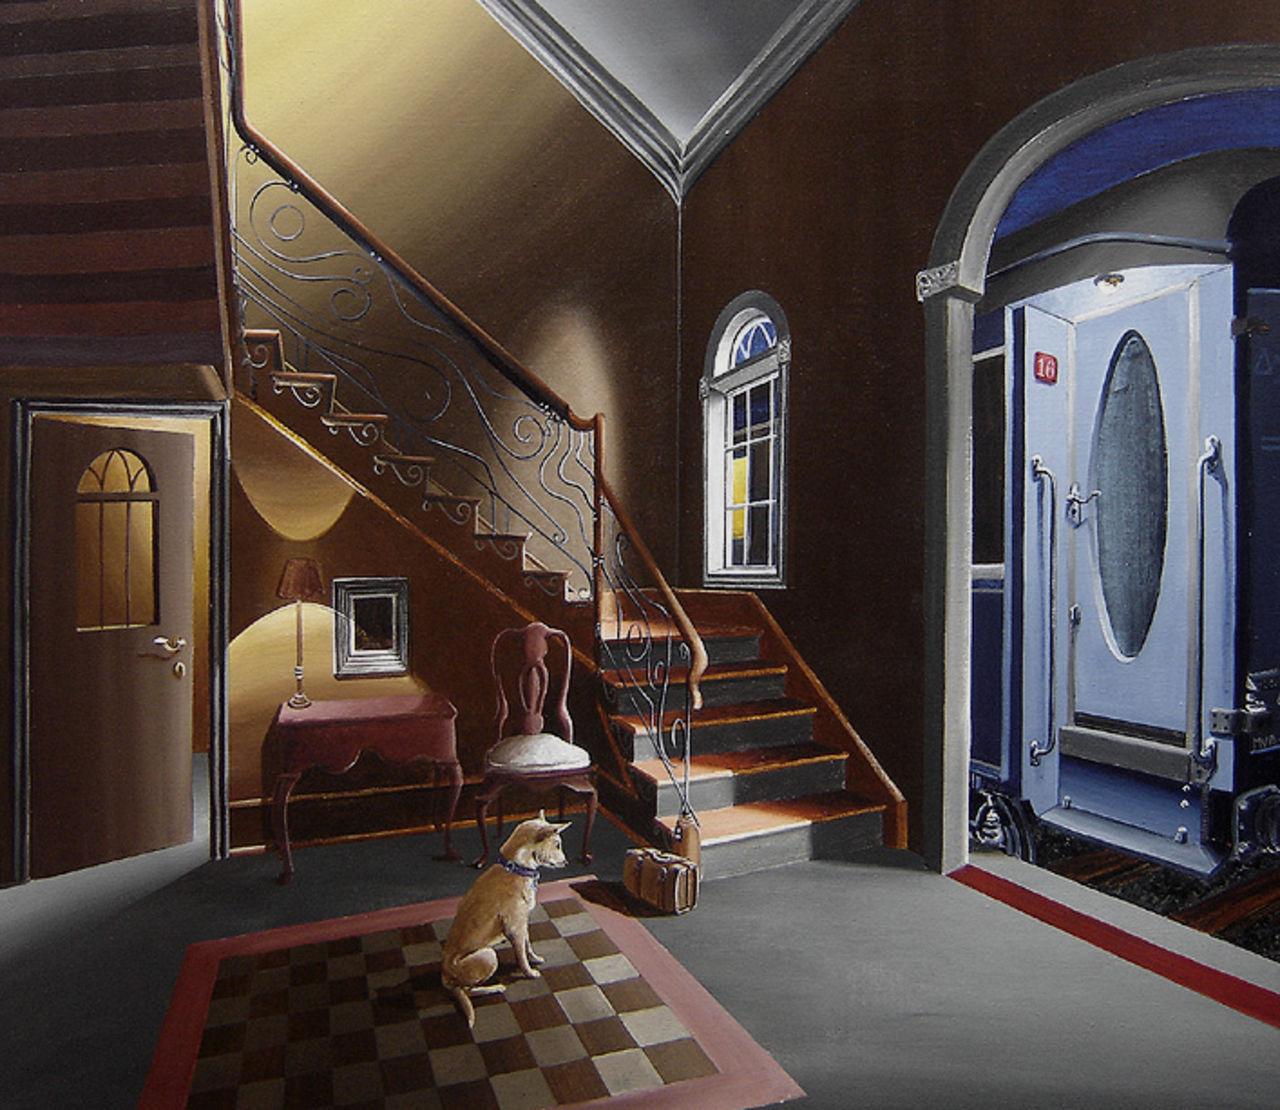 "olivier lamboray "" La Veille du Depart "" 2010 - Belgian Surrealism by Olivier lamboray"